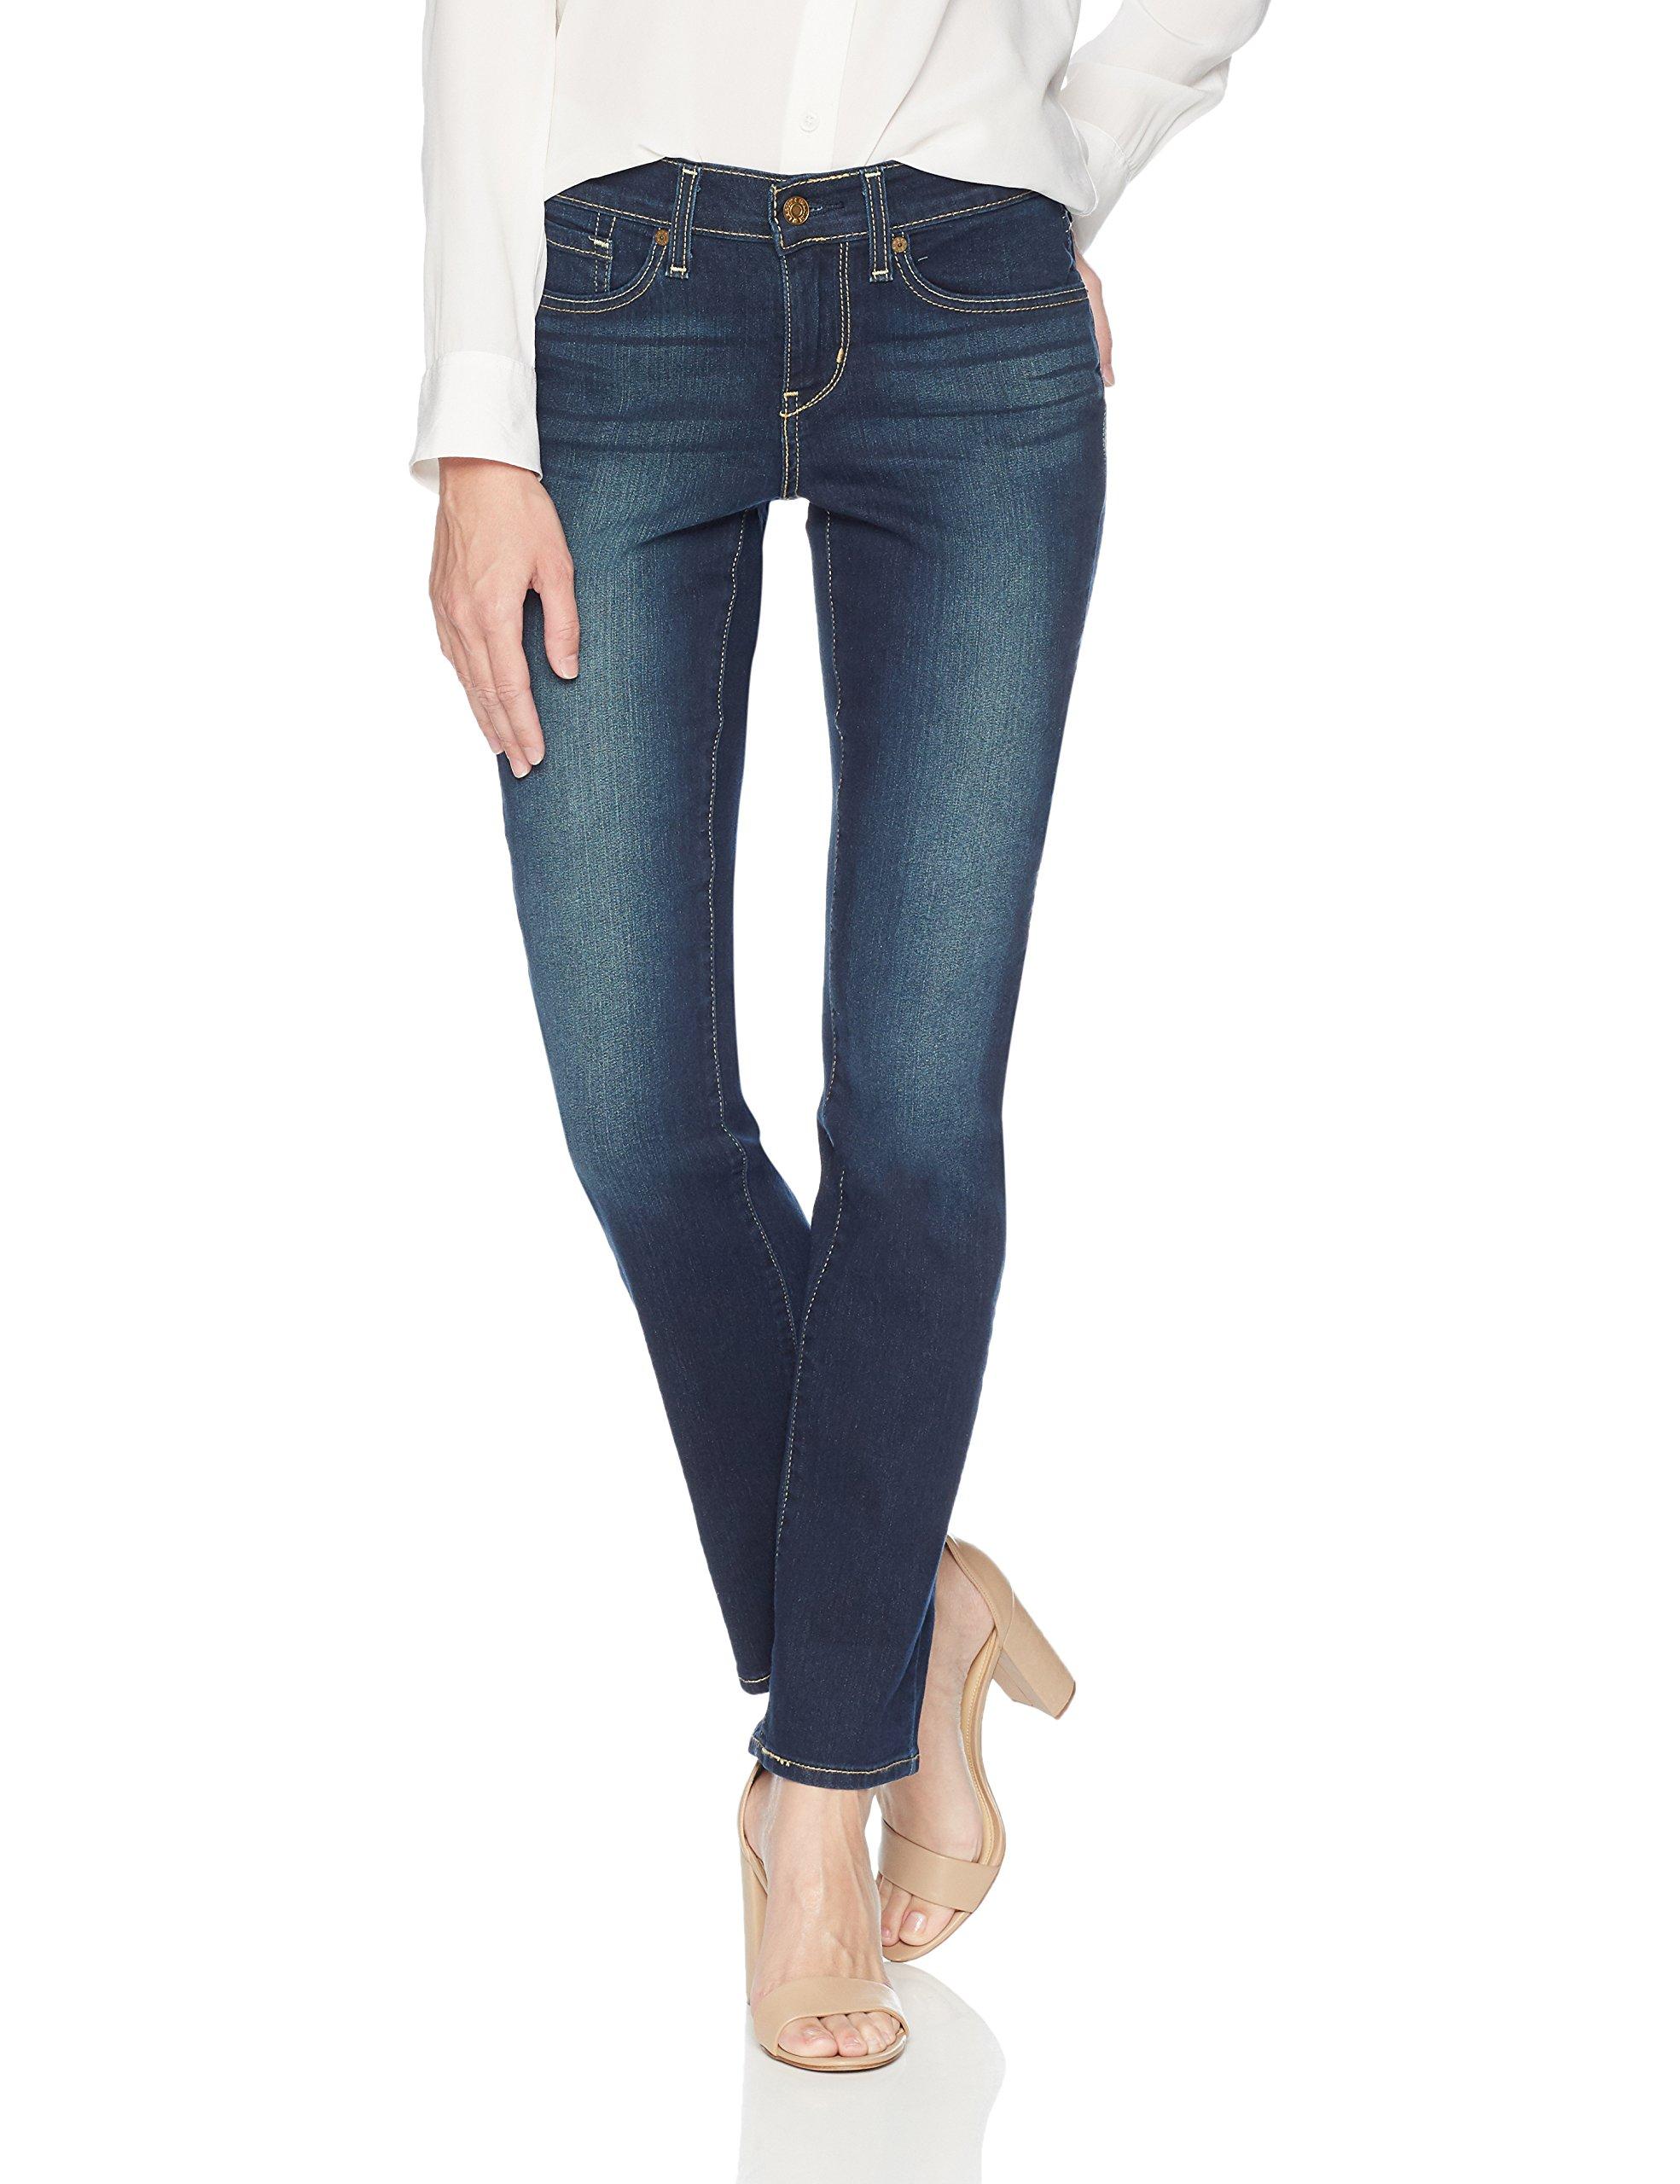 Signature by Levi Strauss & Co Women's Curvy Straight Jeans Pants, Splendor, 14 Medium